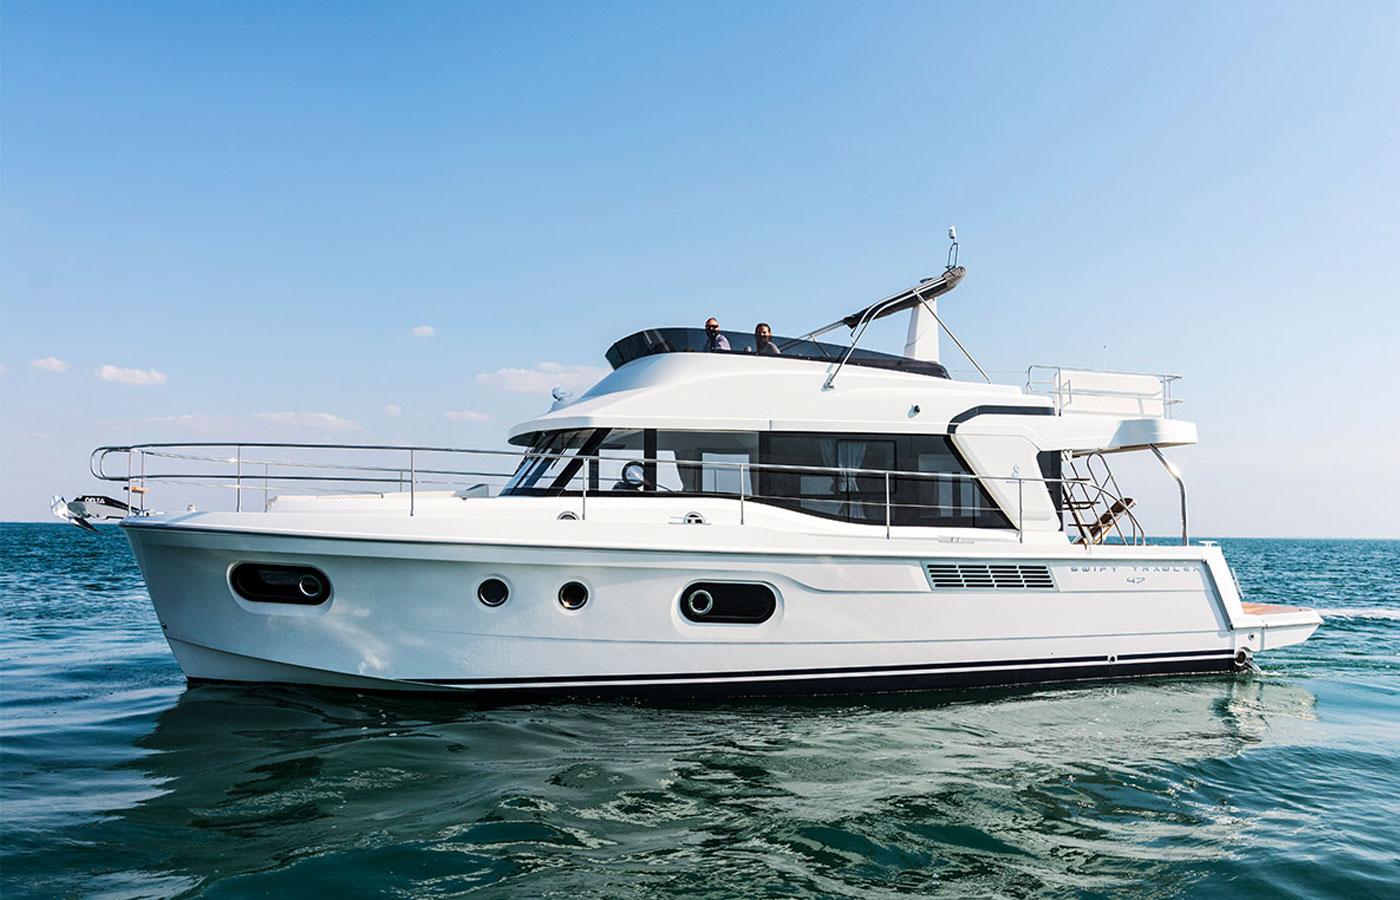 Beneteau Swift Trawler 47 Review [Swift Pacific Adventure]